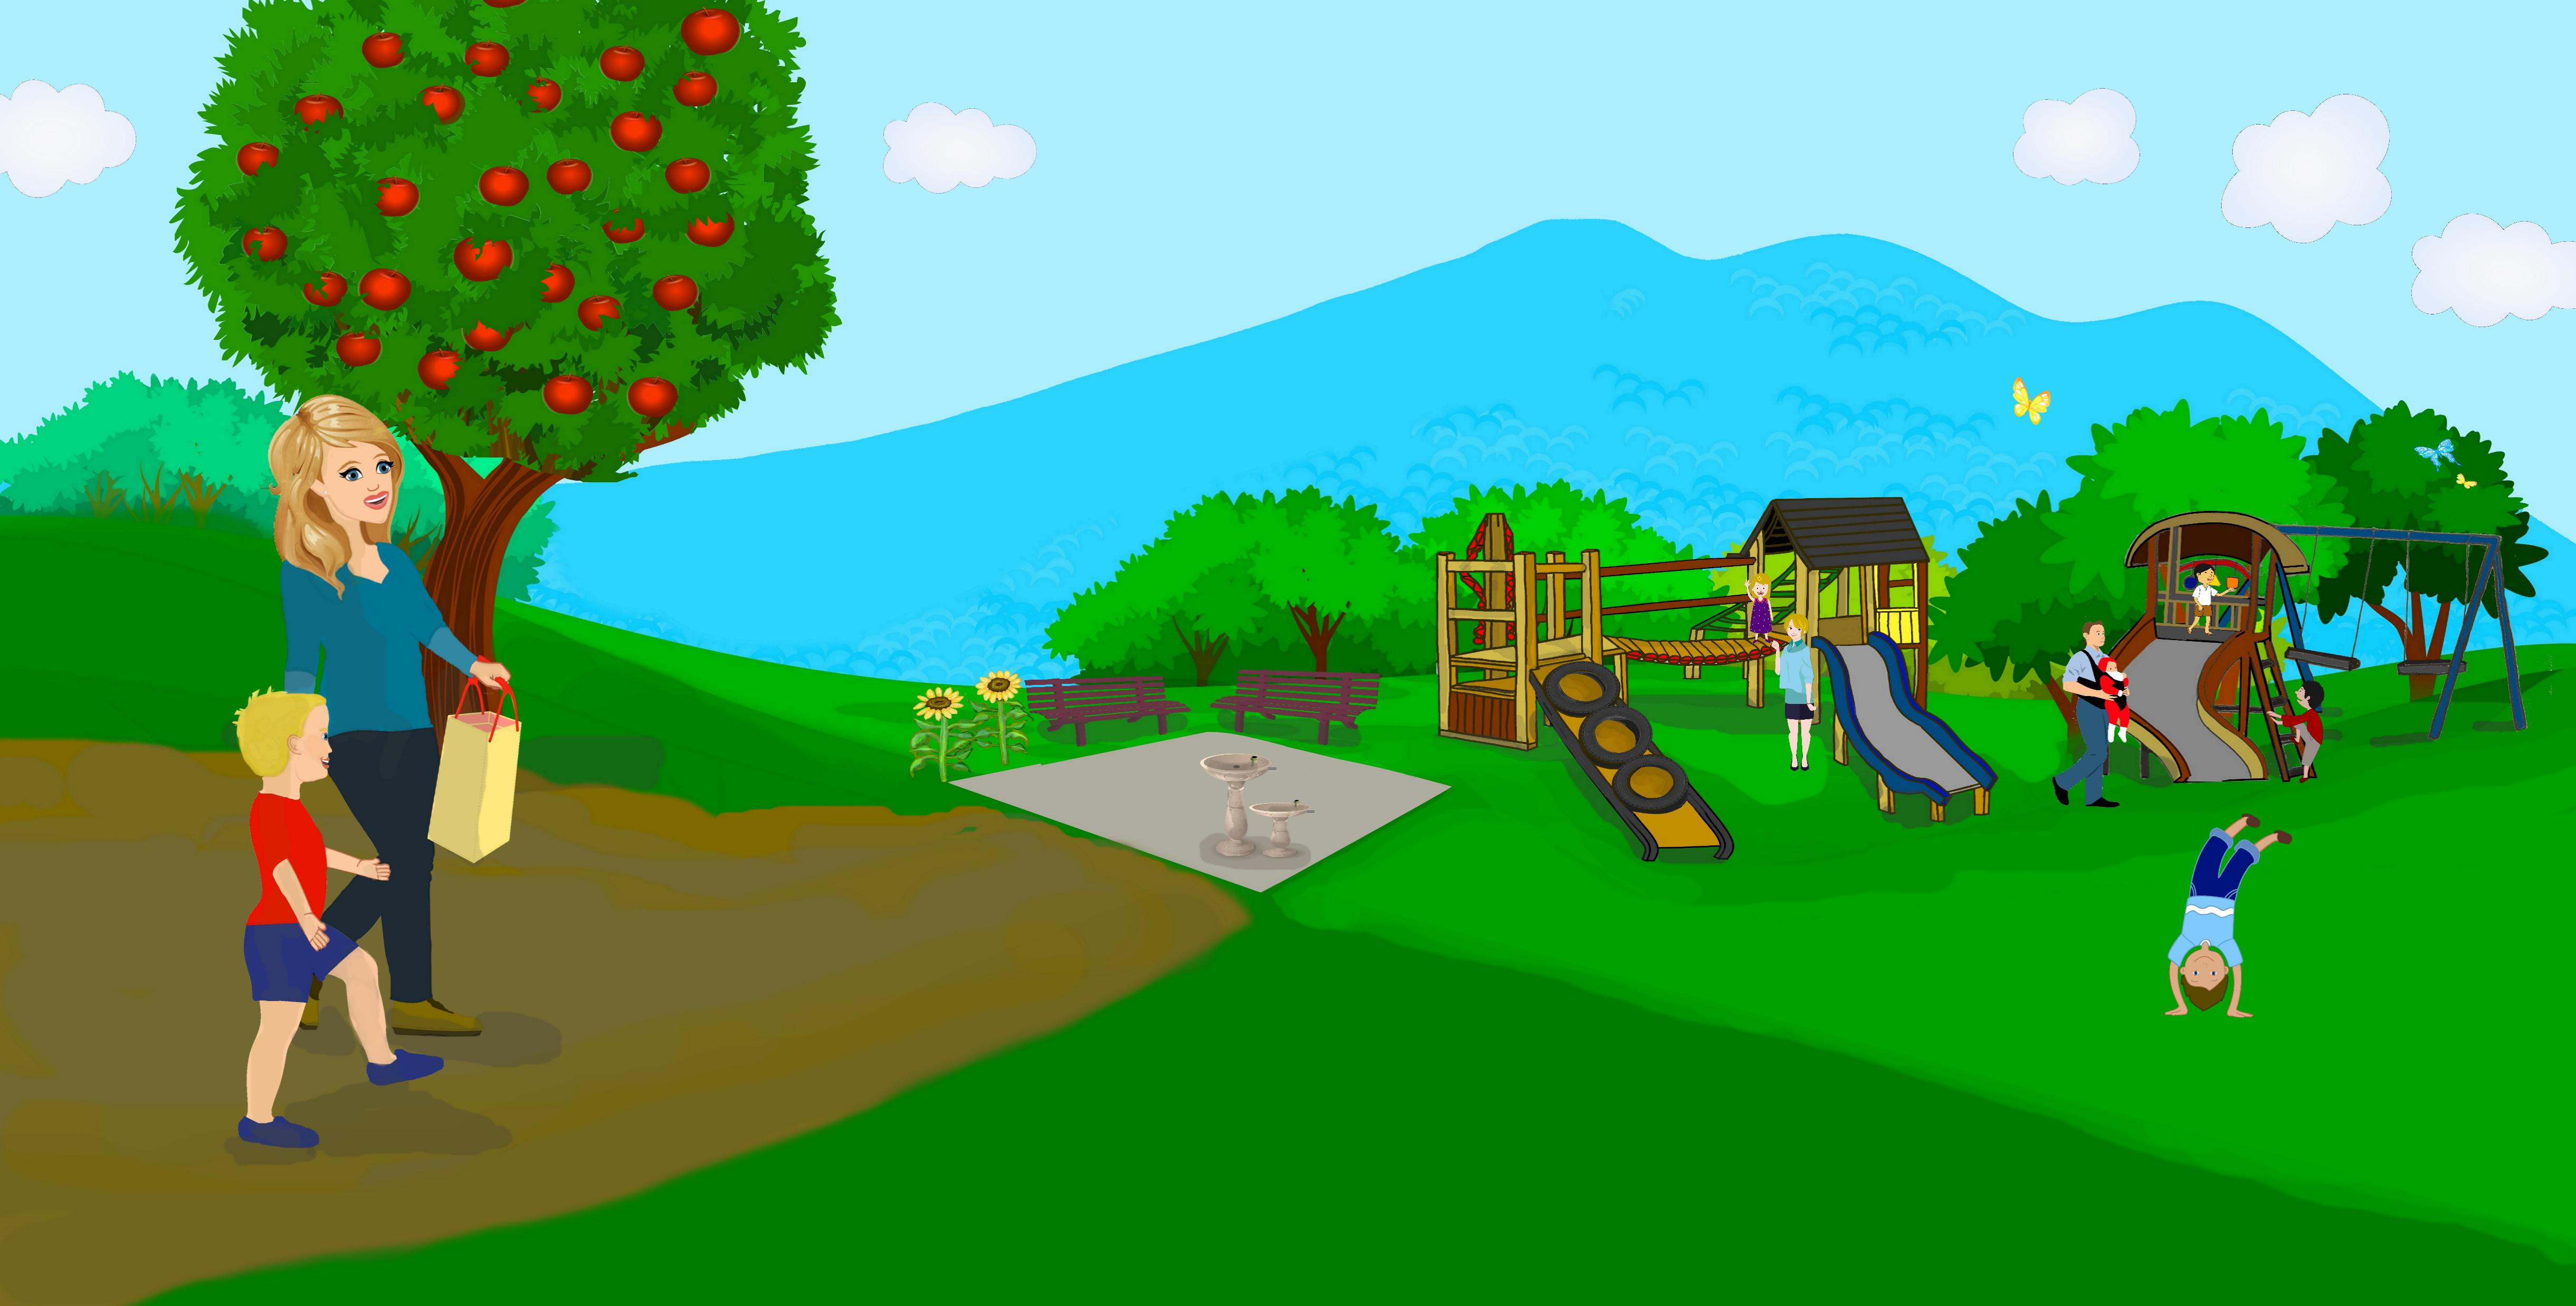 playgroundparkdn7